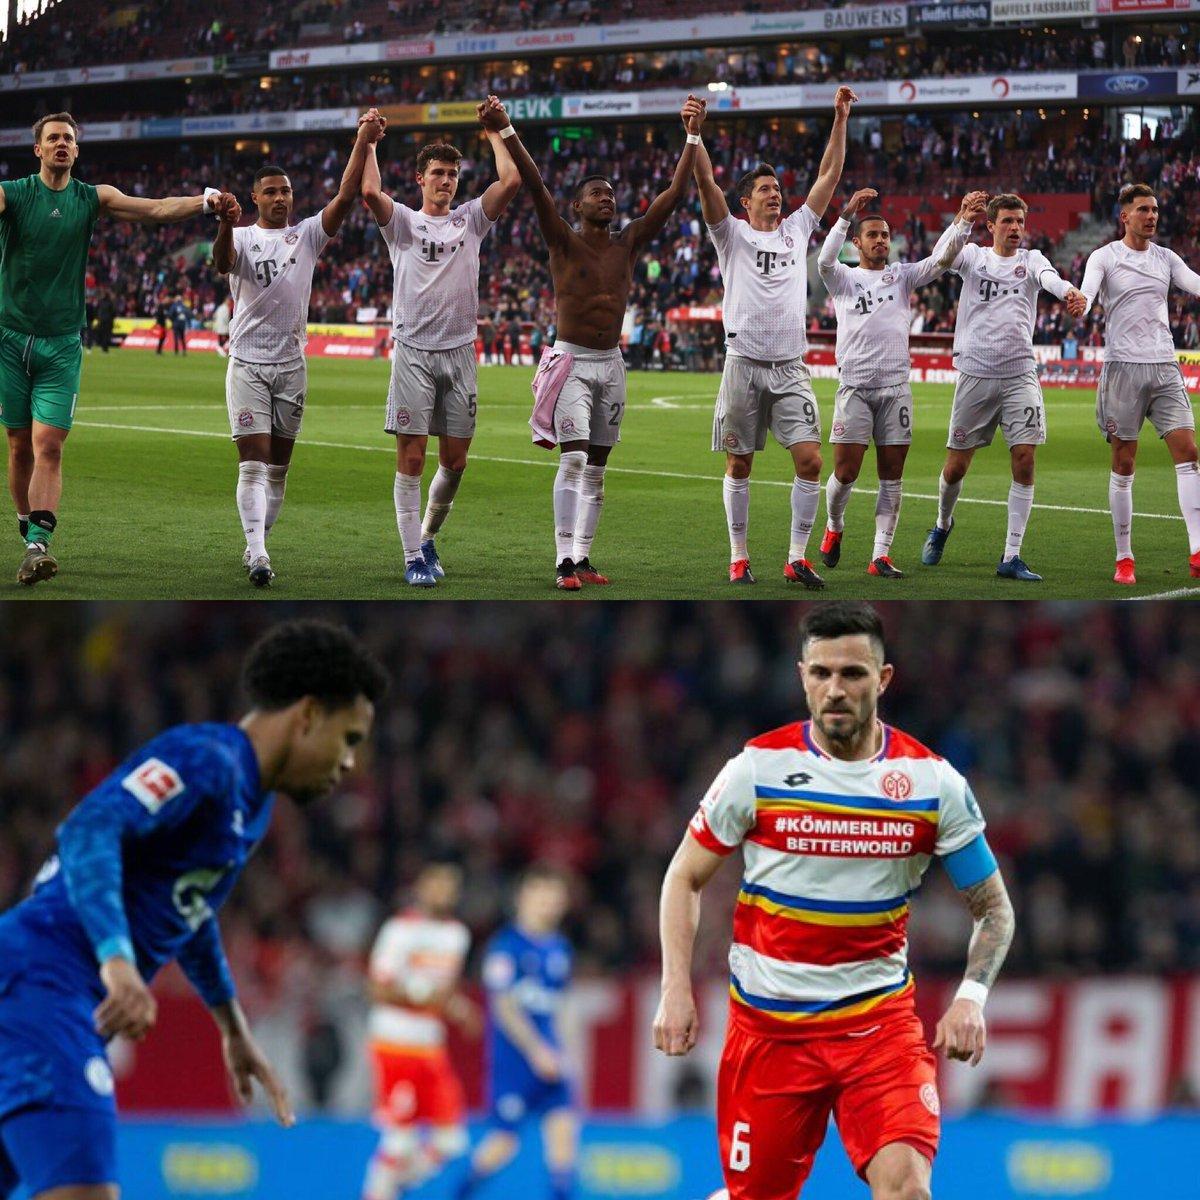 #Bundesliga Fecha 22:  Köln 1-4 Bayern Munich 70' Uth (FCK) 3' Lewandowski, 5' Coman, 12' 66' Gnabry (BAY)  Mainz 0-0 Schalke 04 pic.twitter.com/cEazdNUGu0